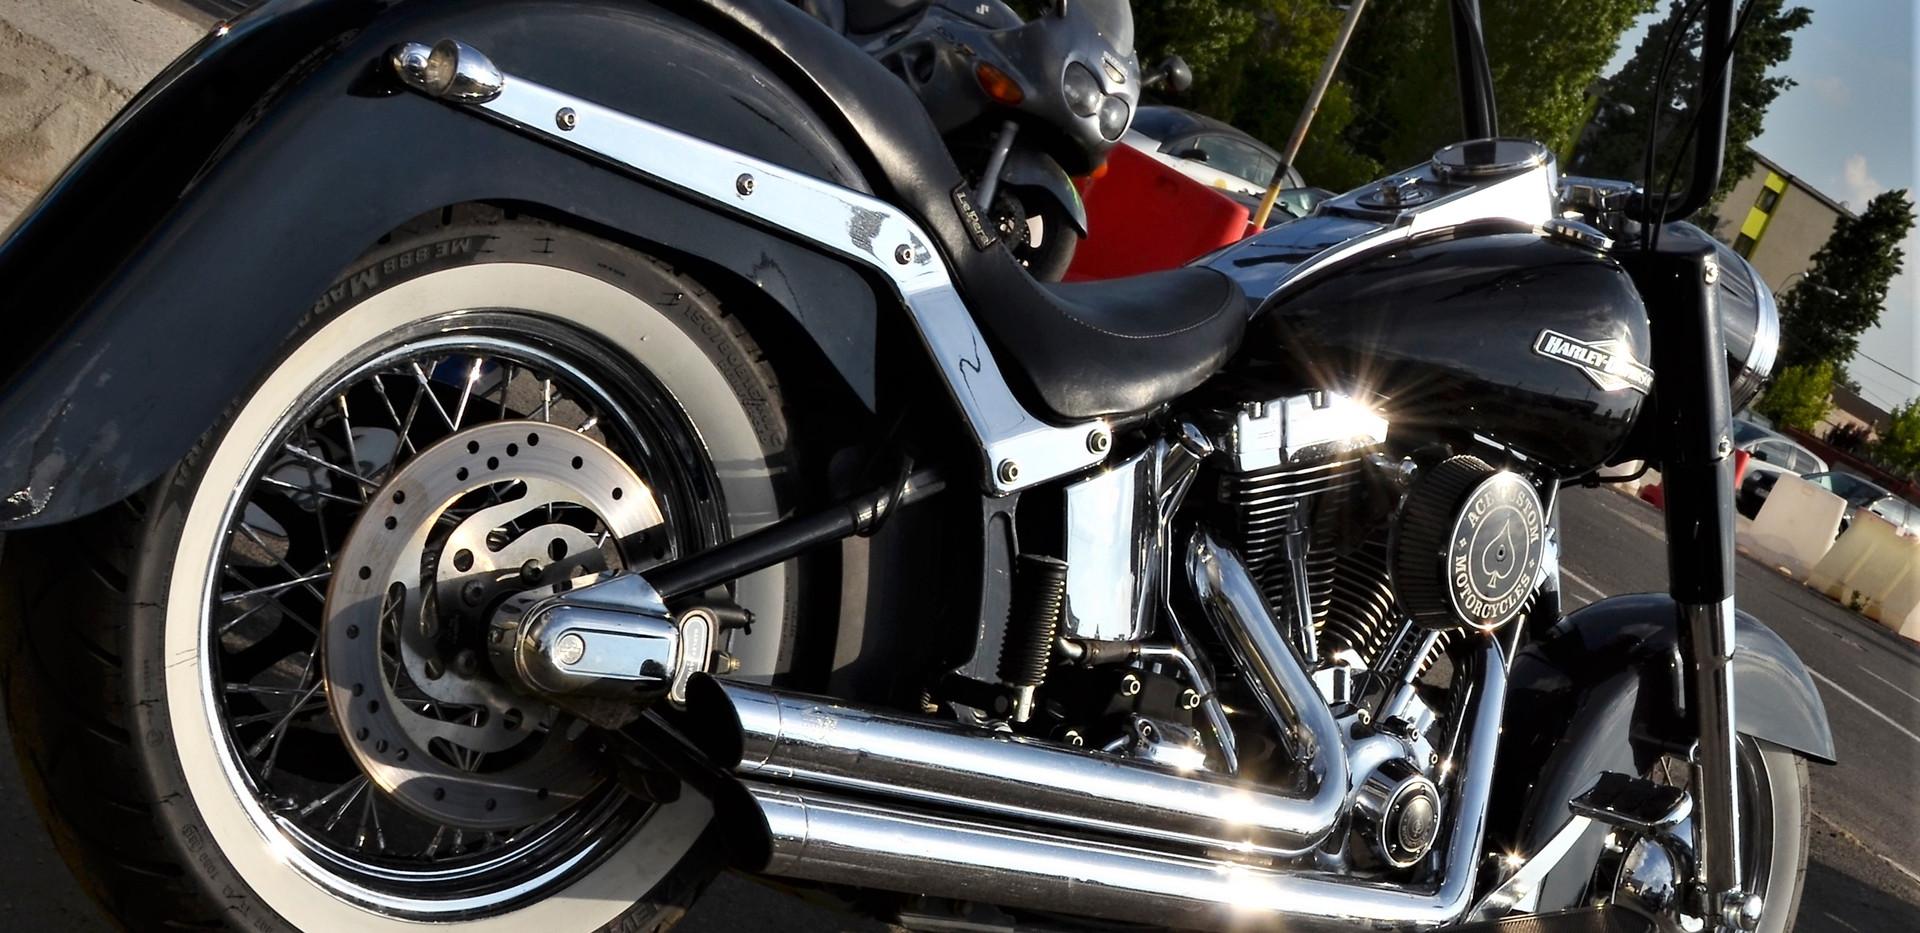 Harley Davidson Softail Heritage Gangsta 4